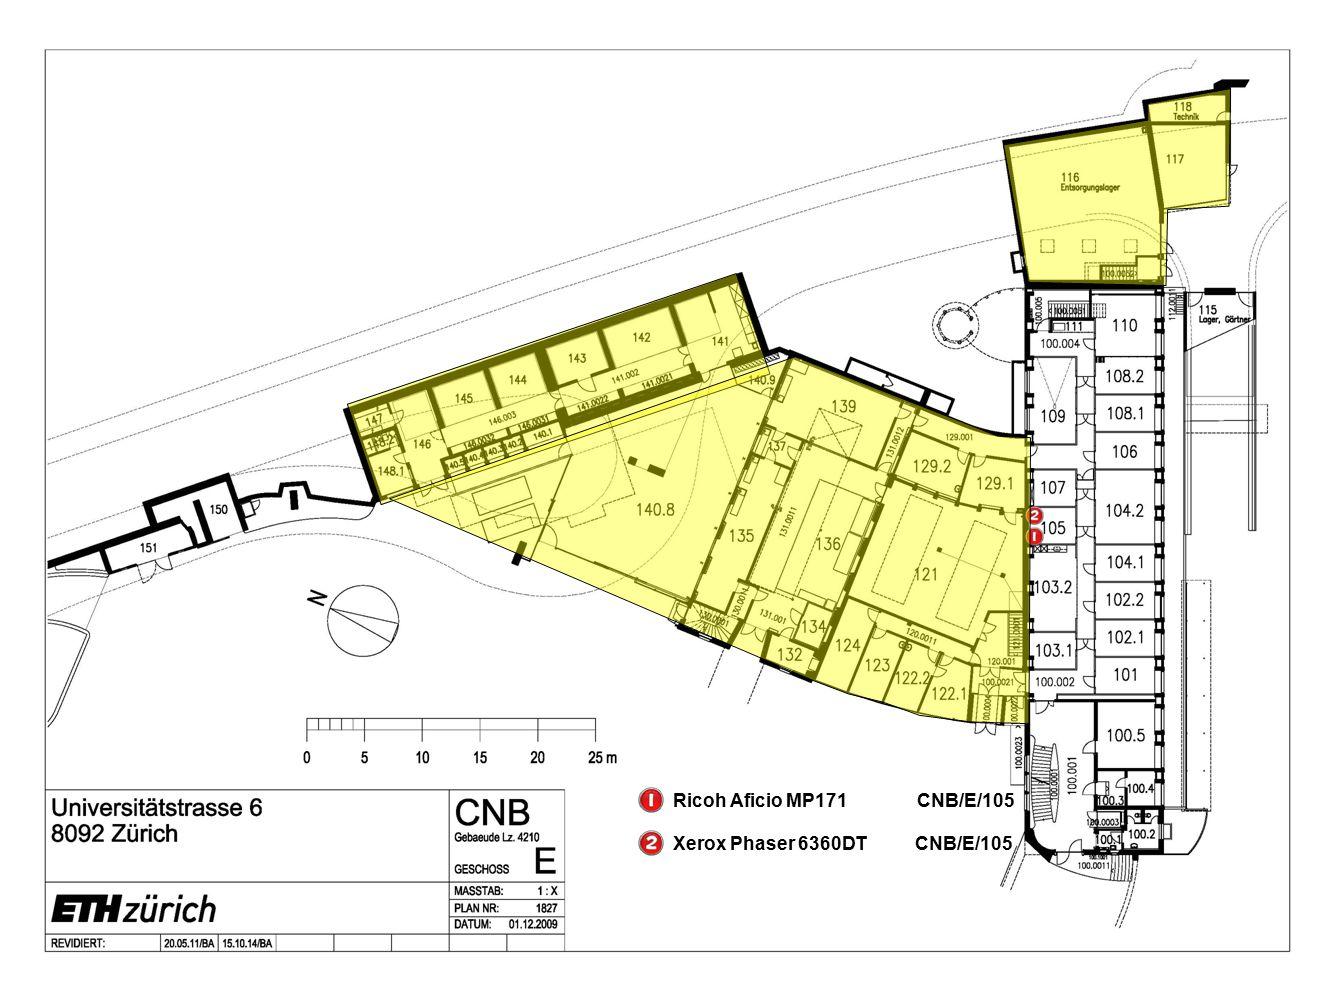 Ricoh Aficio MP2000 CNB/F/103.1 Xerox Phaser 6360DN CNB/F/103.1 planned: Nashuatec MP C3003 CNB/F/100.002